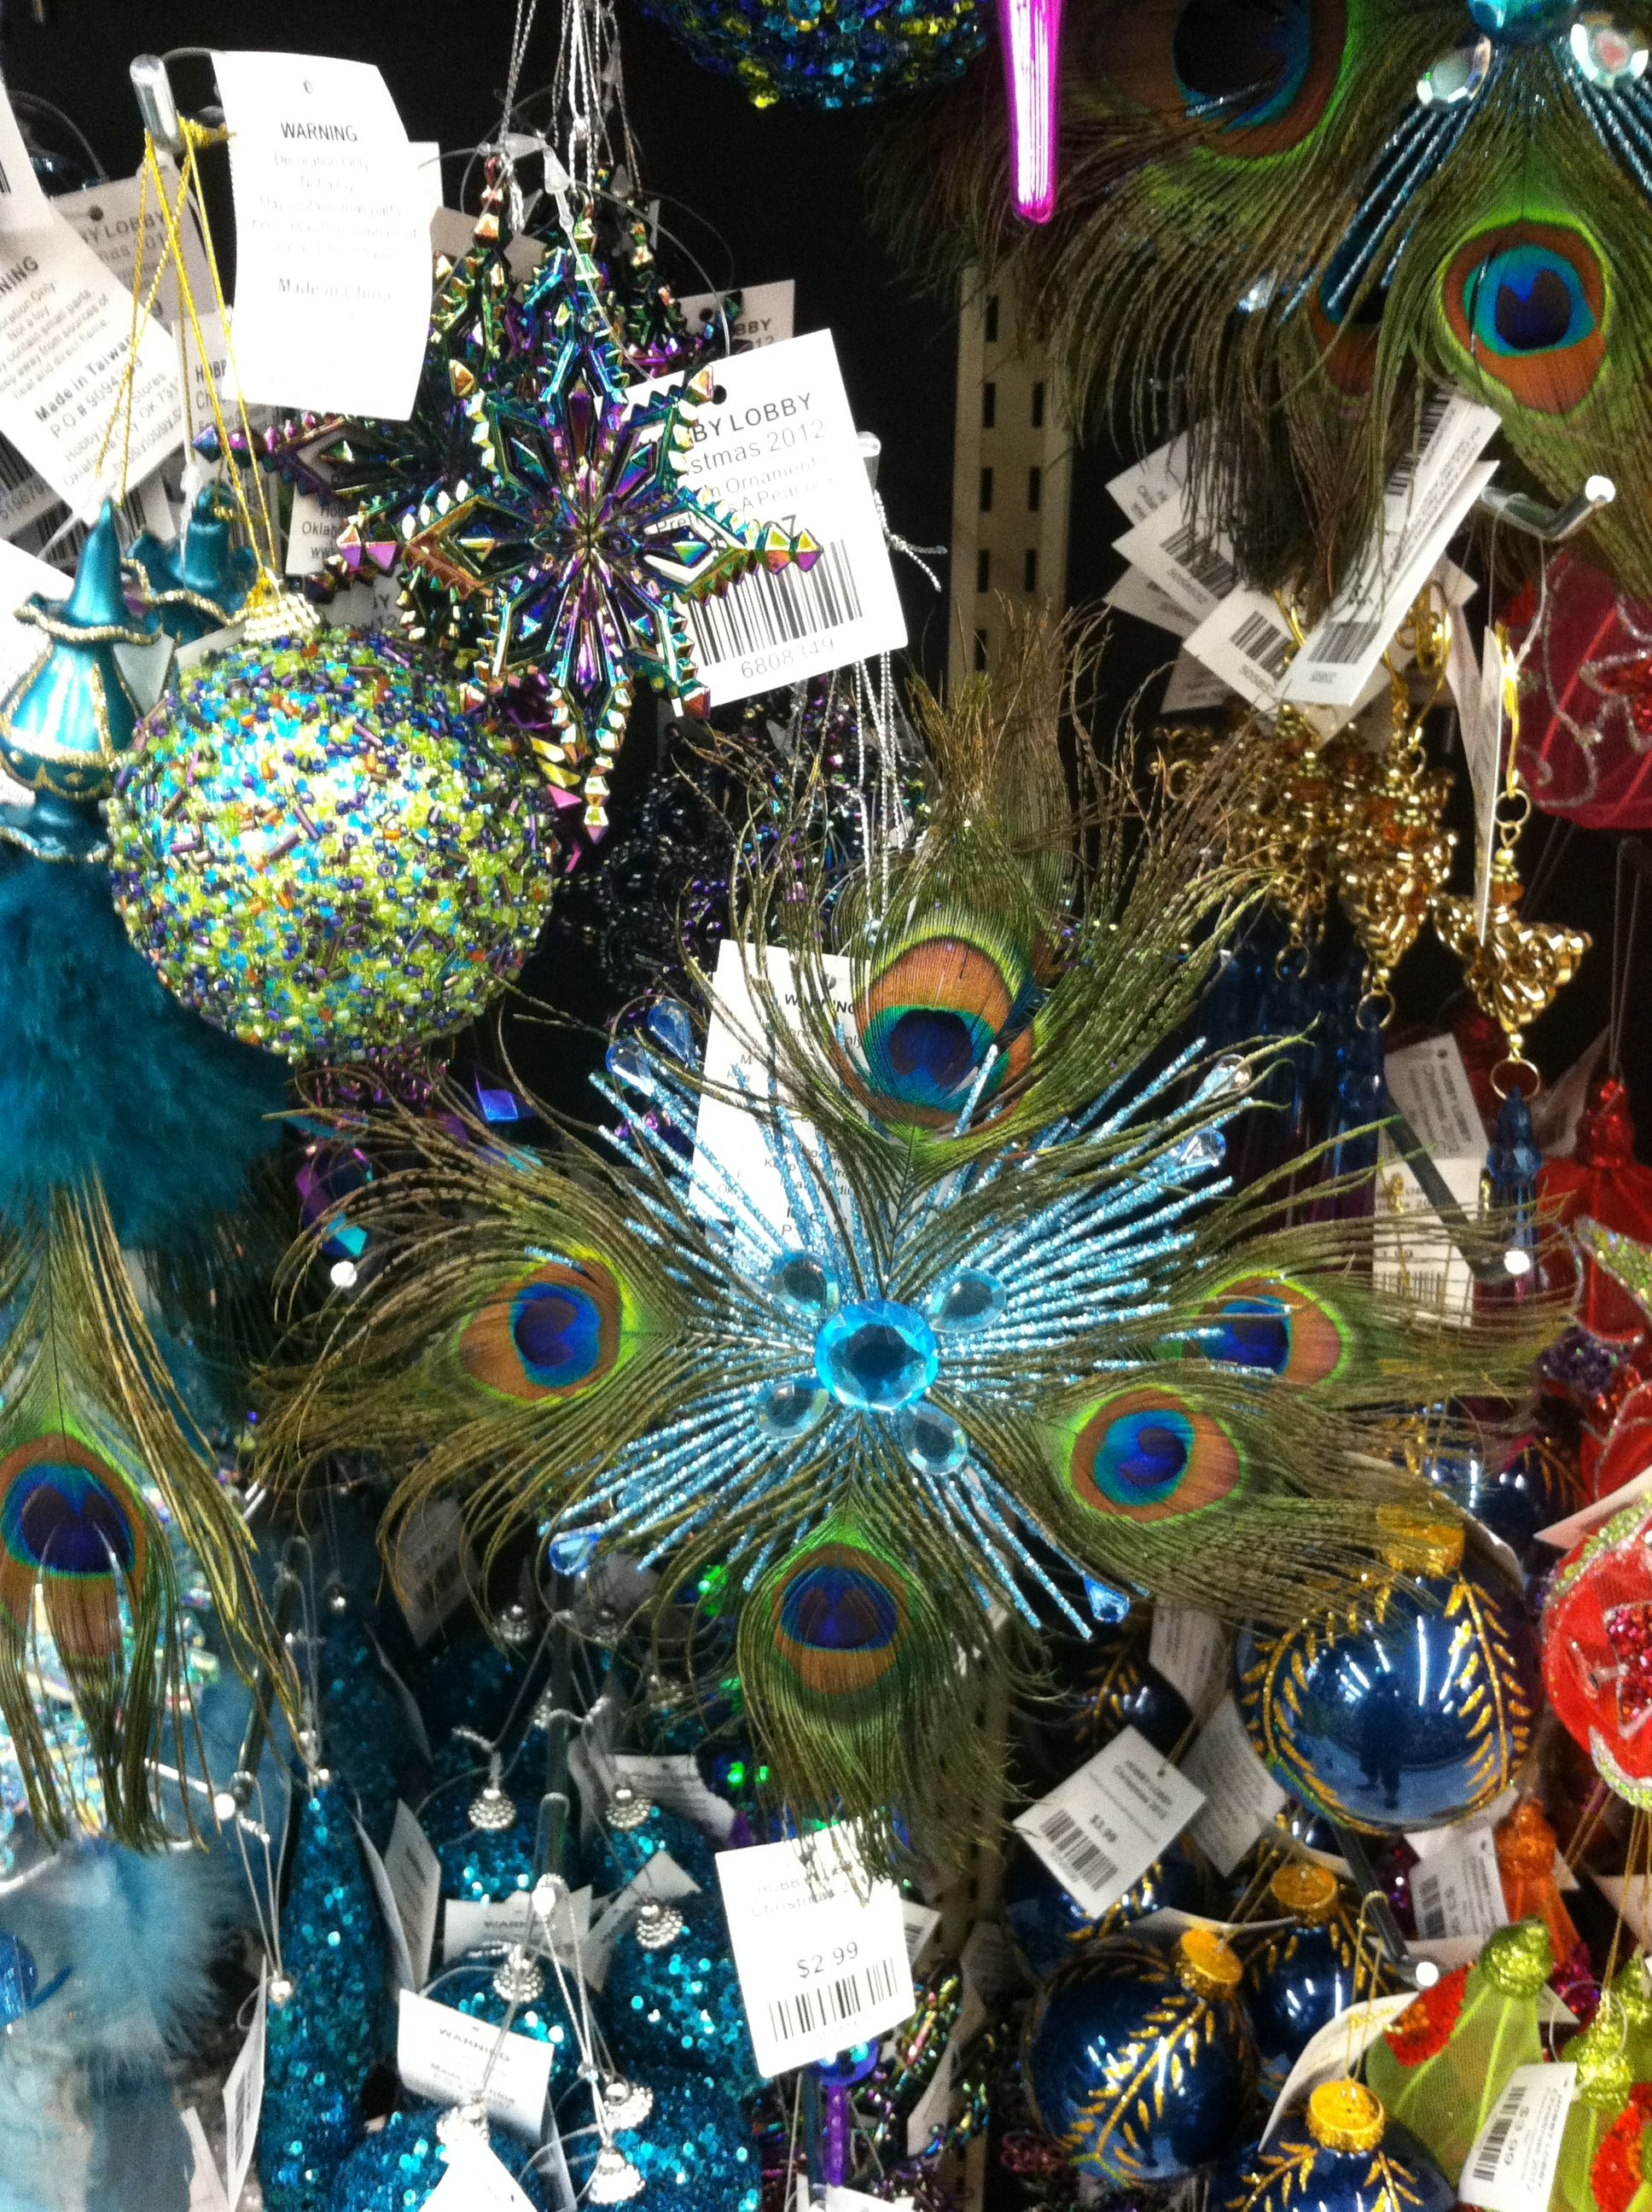 Hobby lobby glass ornaments - Peacock Ornaments Hobbylobby